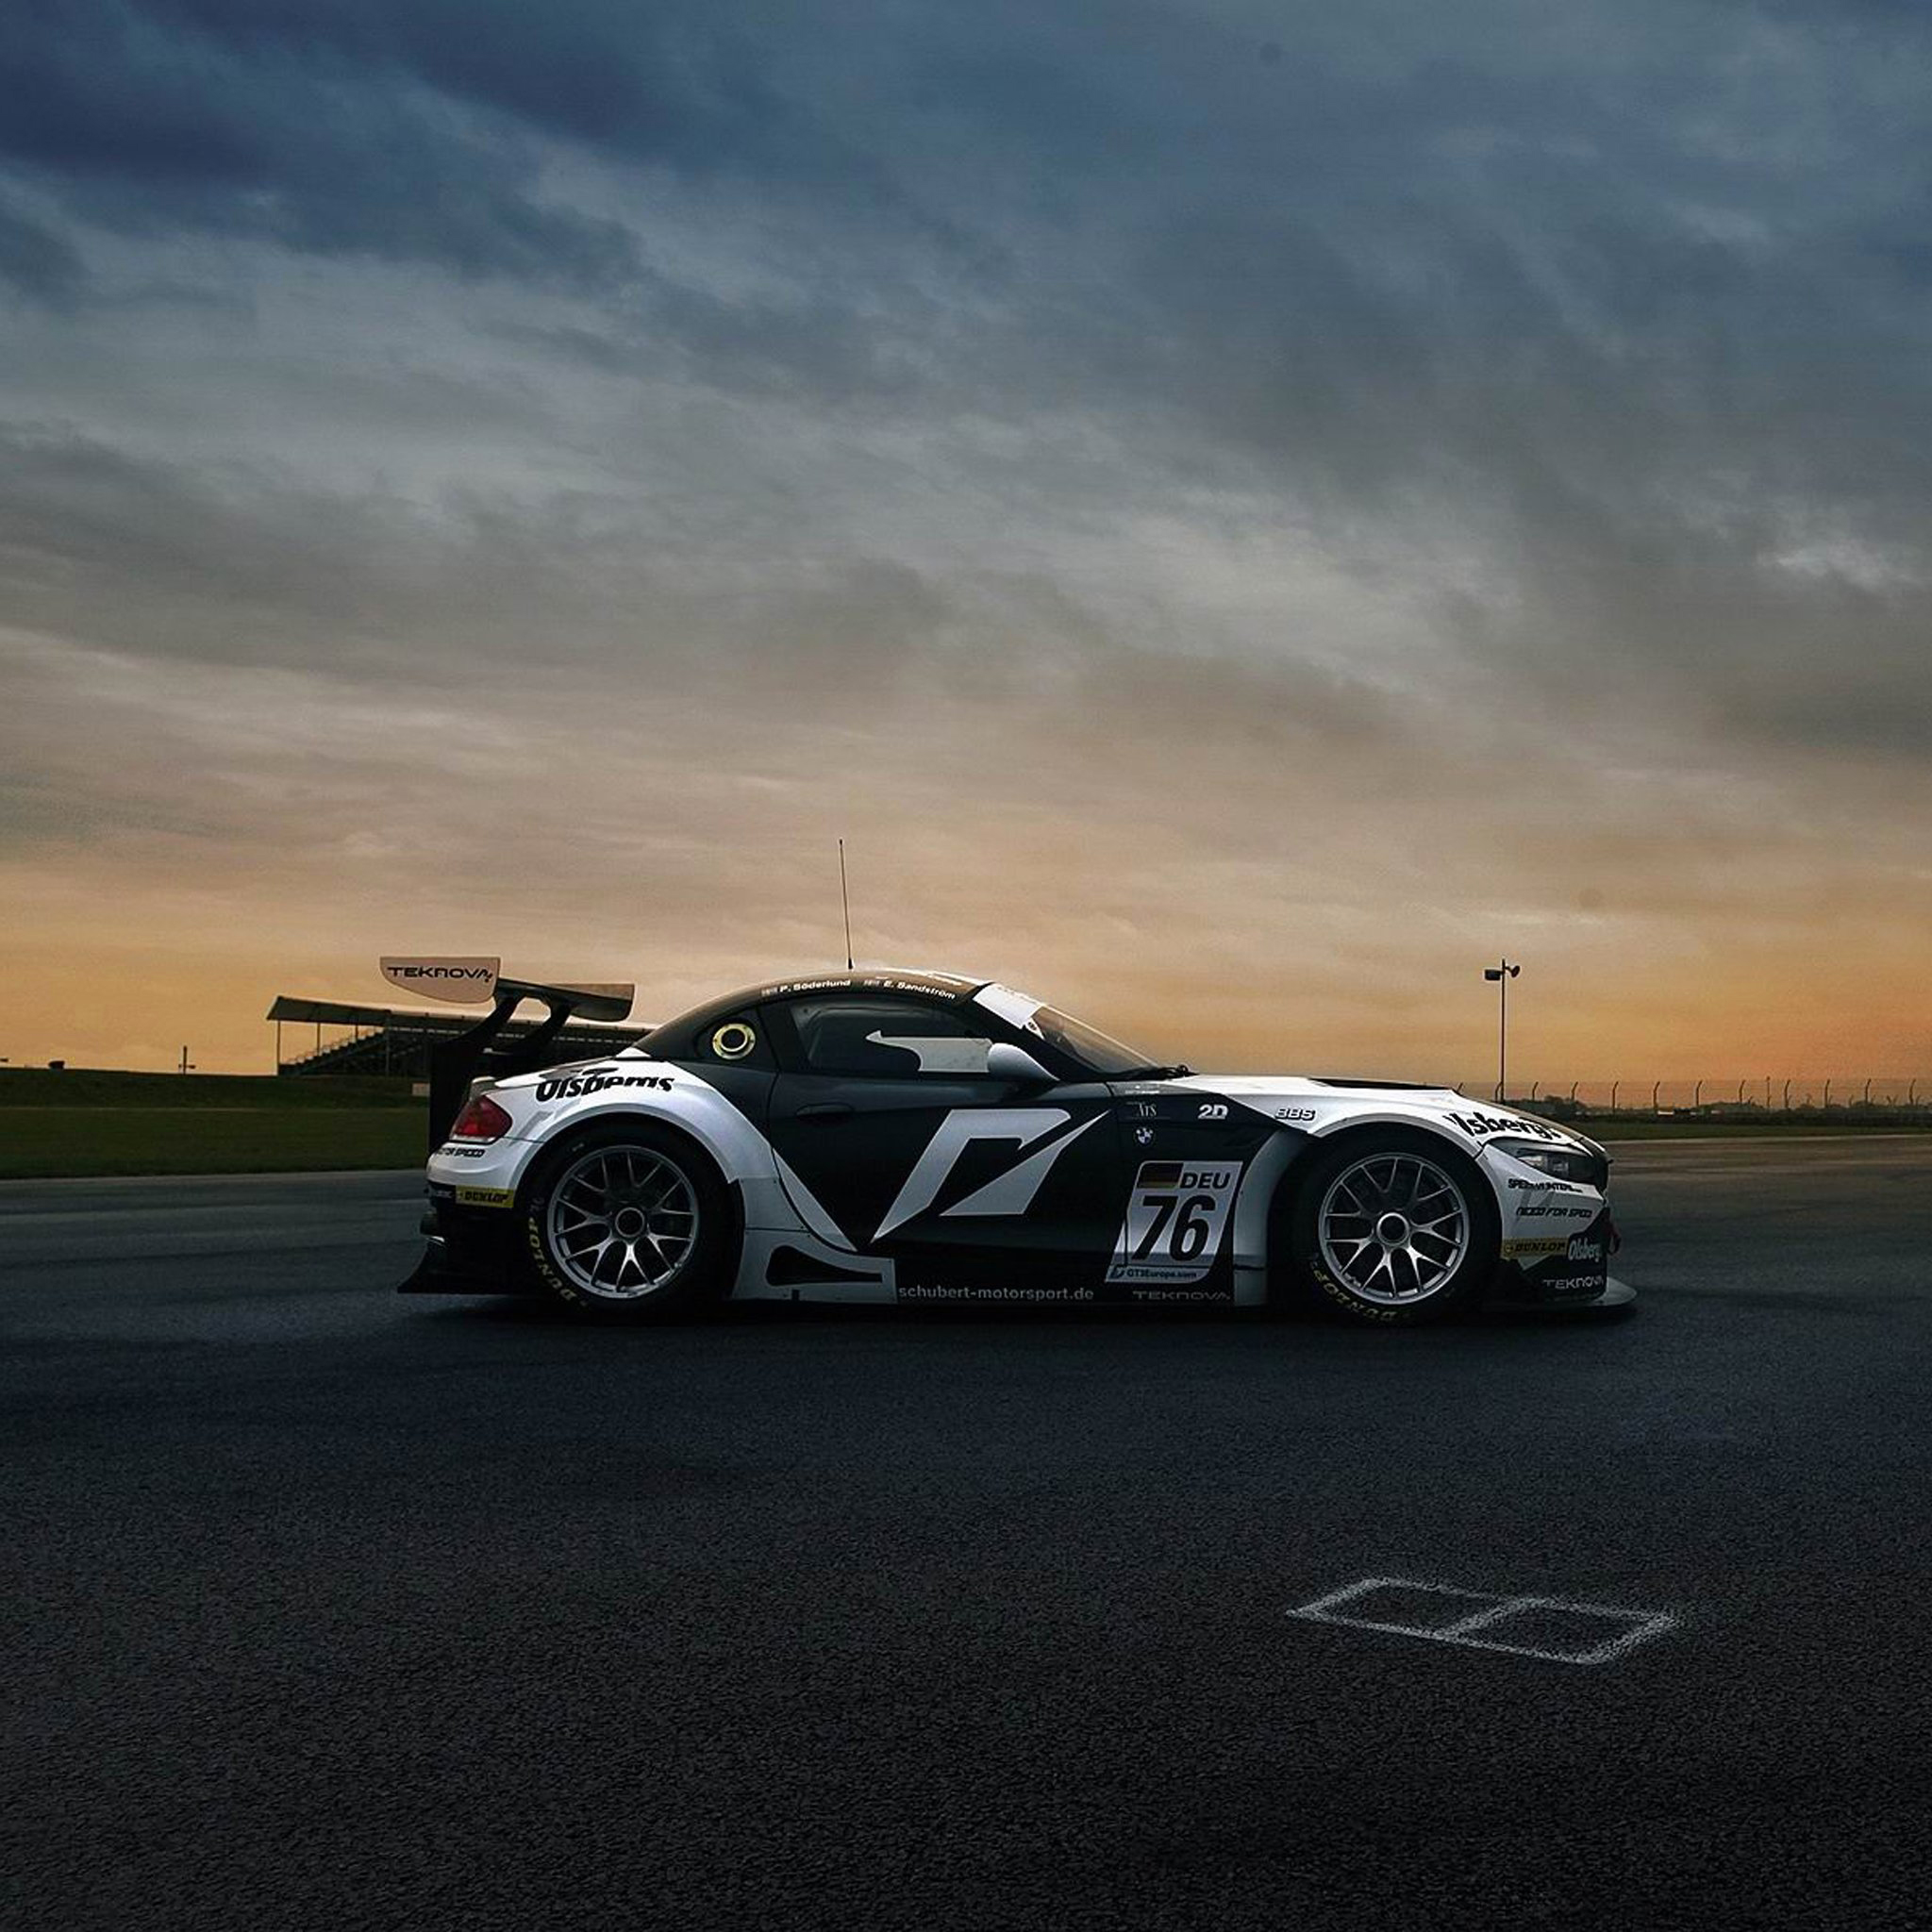 BMW-Z4-Sportcar-3Wallpapers-iPad-Retina